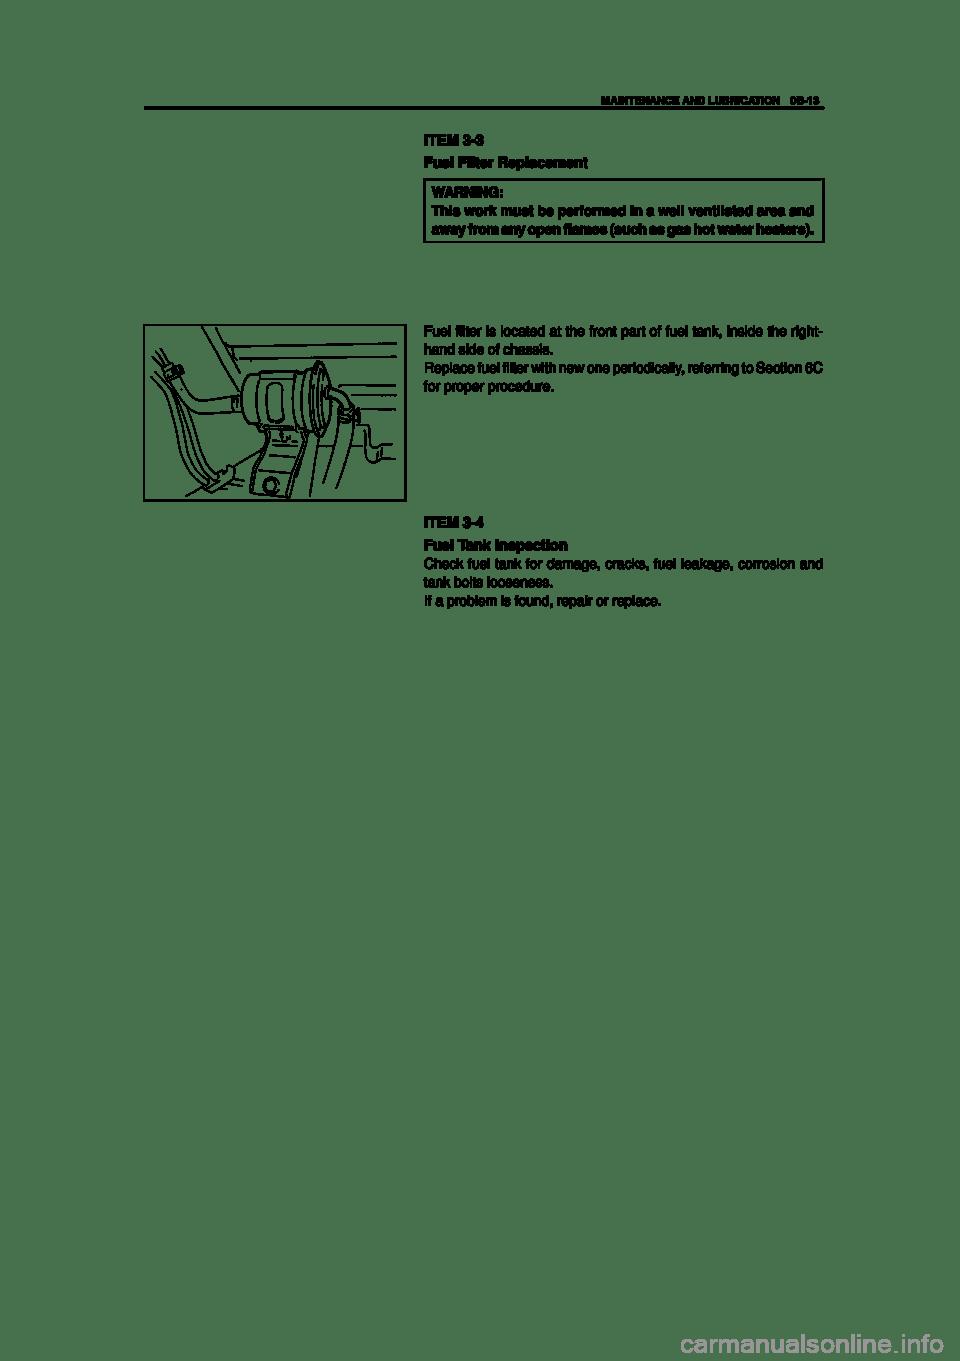 medium resolution of suzuki grand vitara 2002 2 g service workshop manual page 40